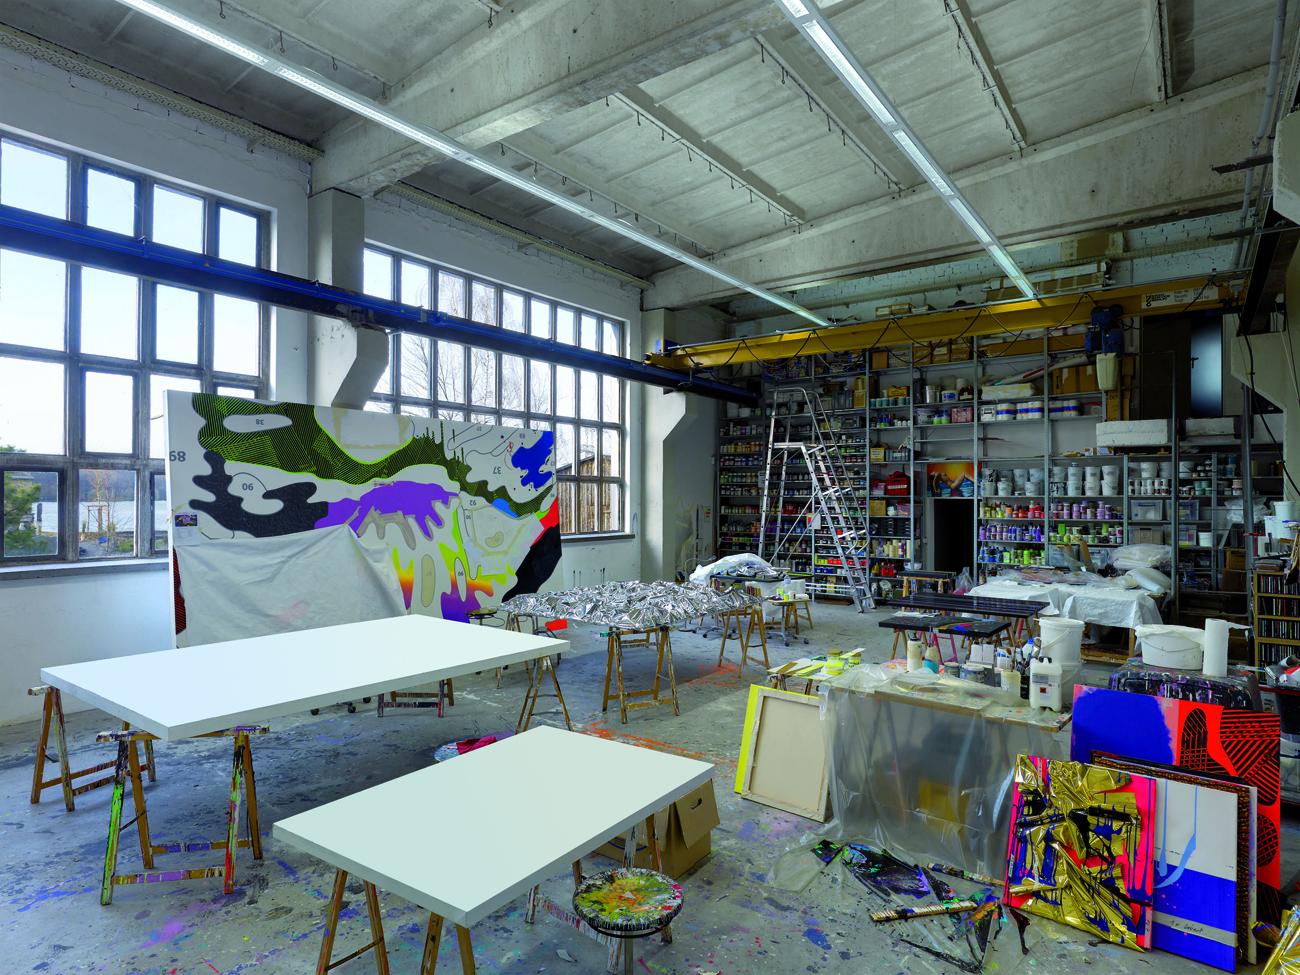 atelier-anselm-reyle-8-tanja-lincke-architekten